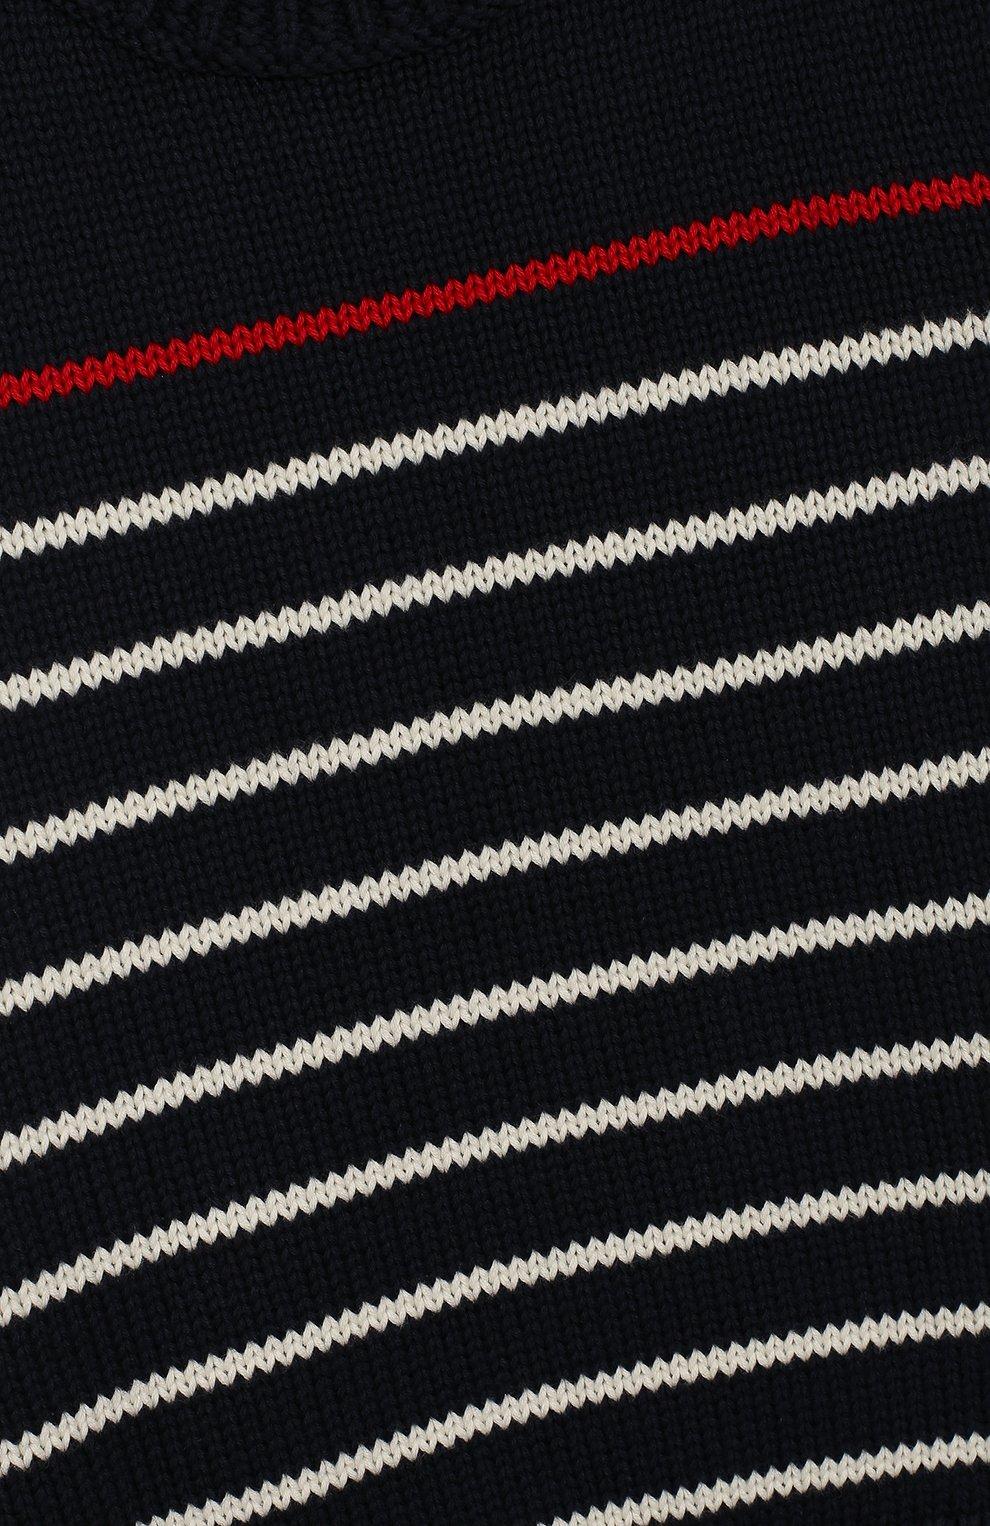 Детский комплект из юбки и топа POLO RALPH LAUREN синего цвета, арт. 313736827 | Фото 6